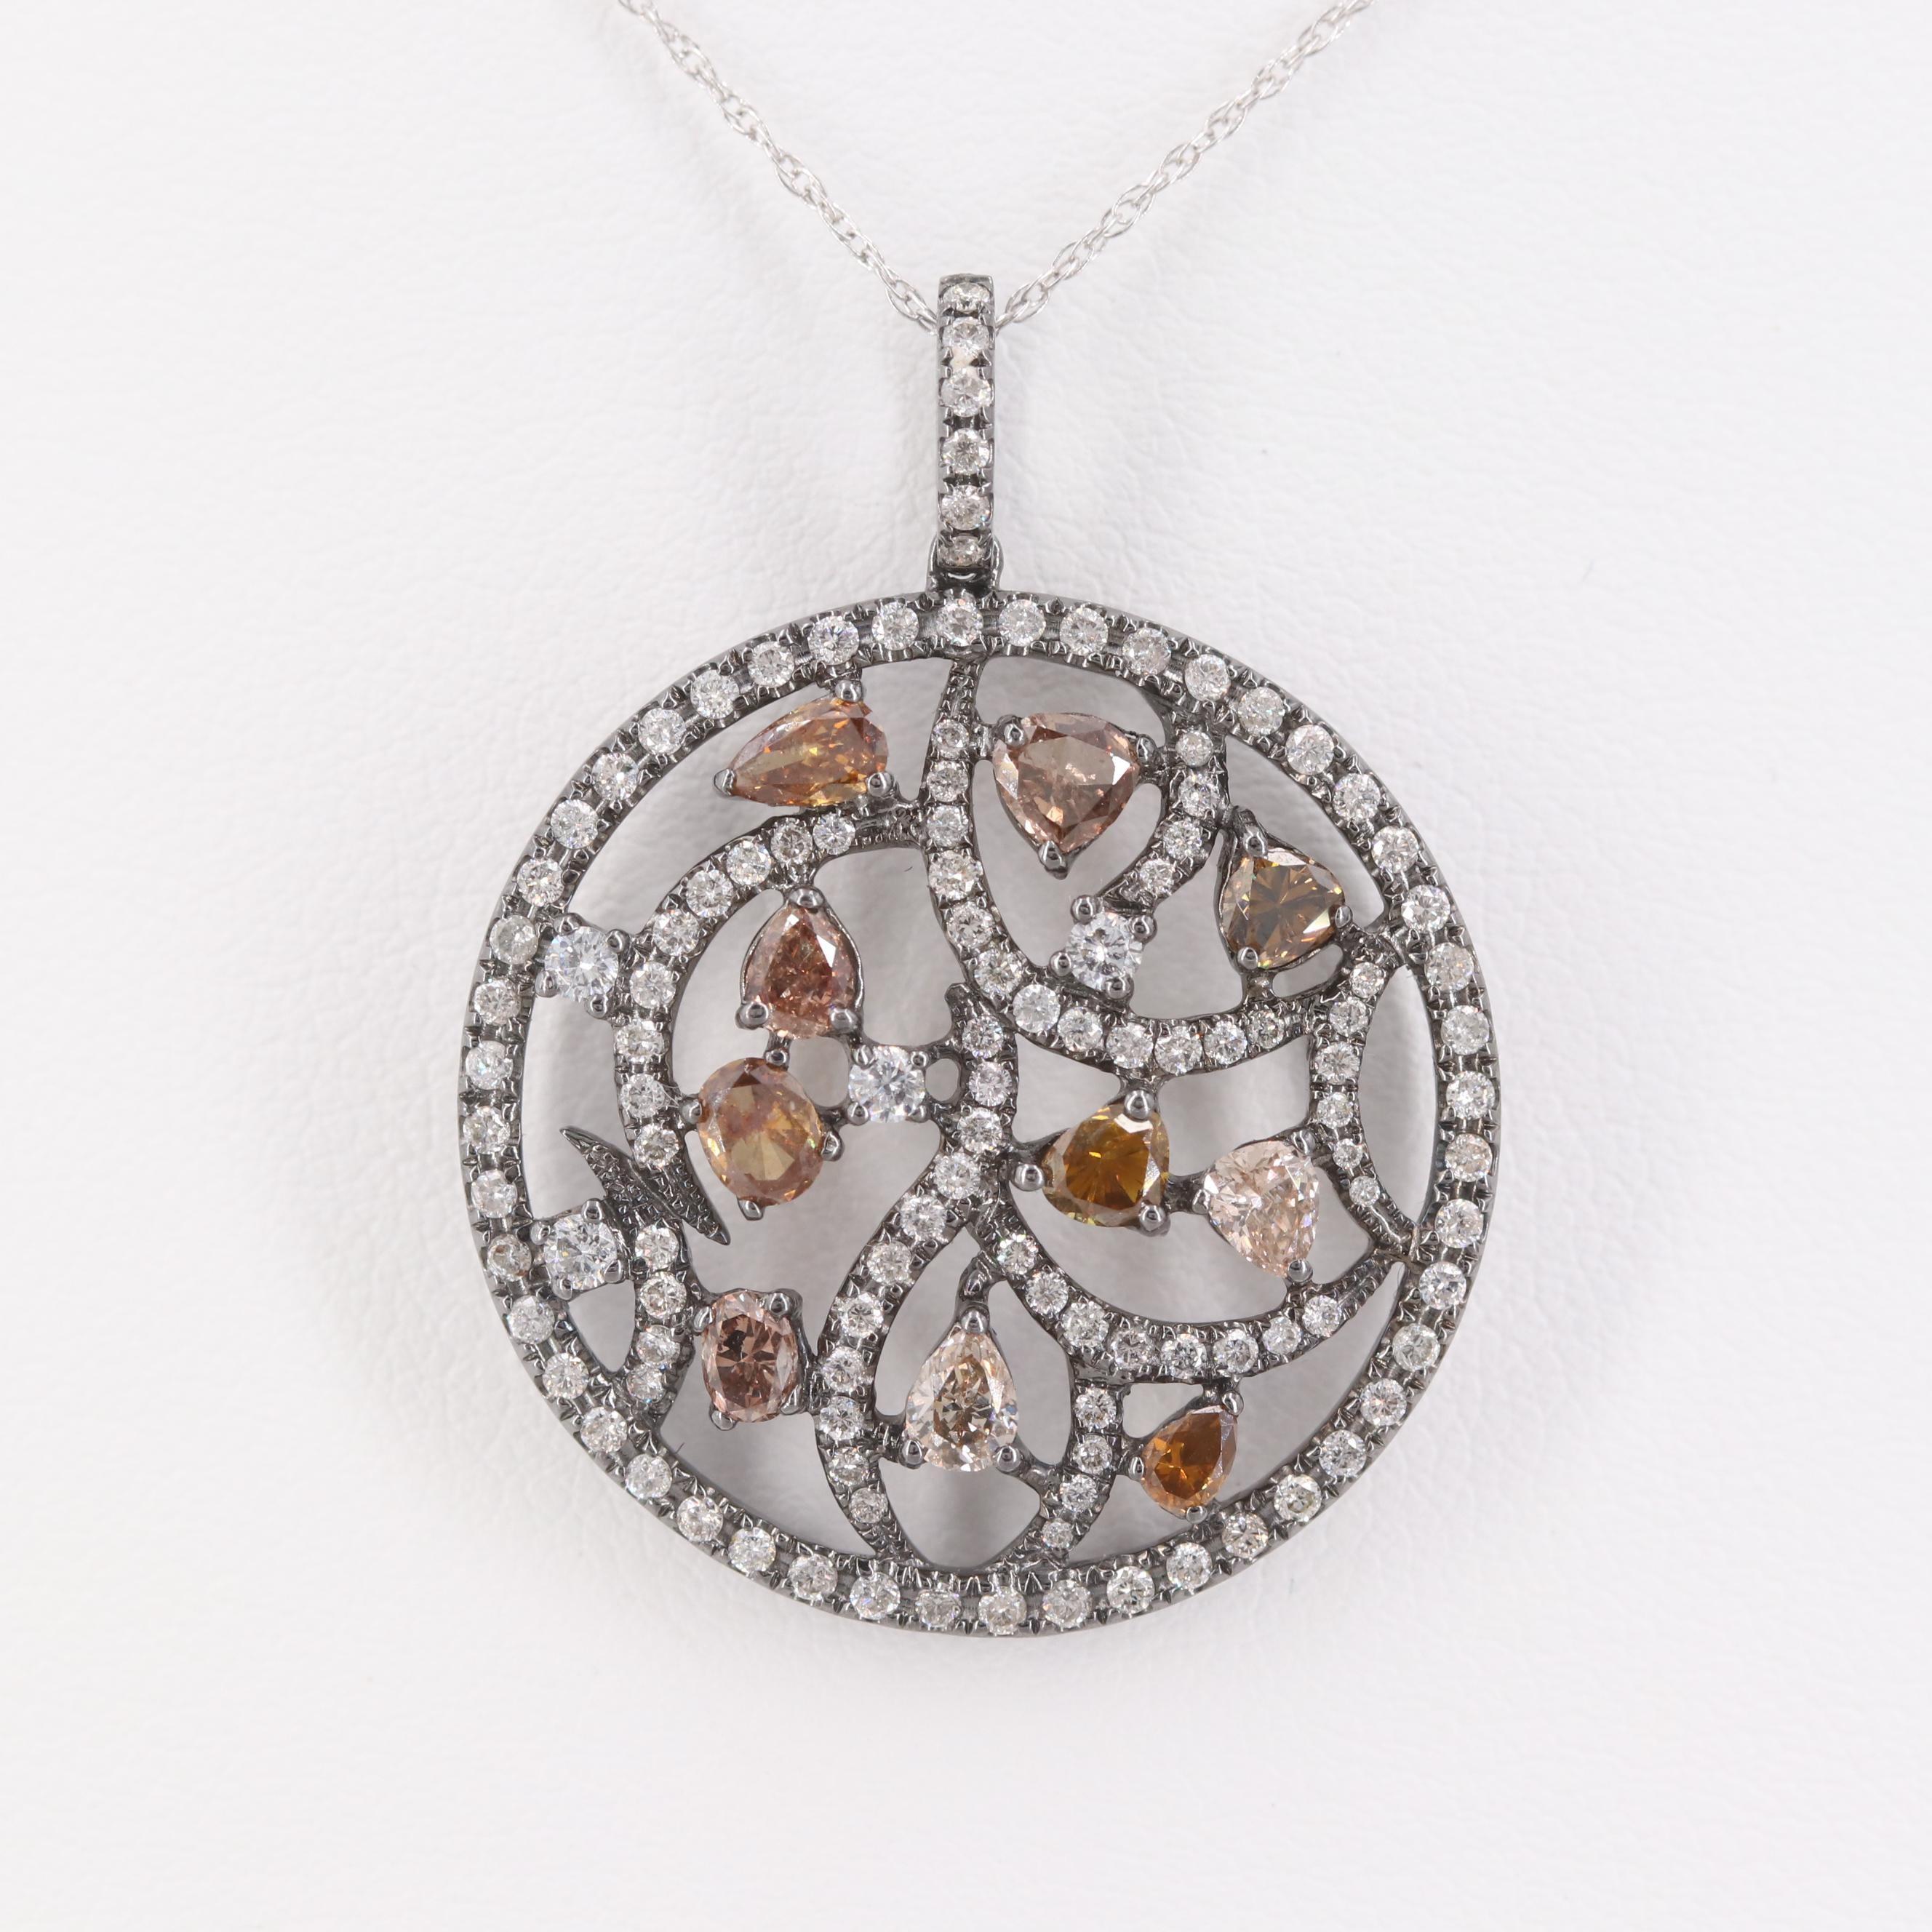 18K White Gold 1.61 CTW Diamond Necklace